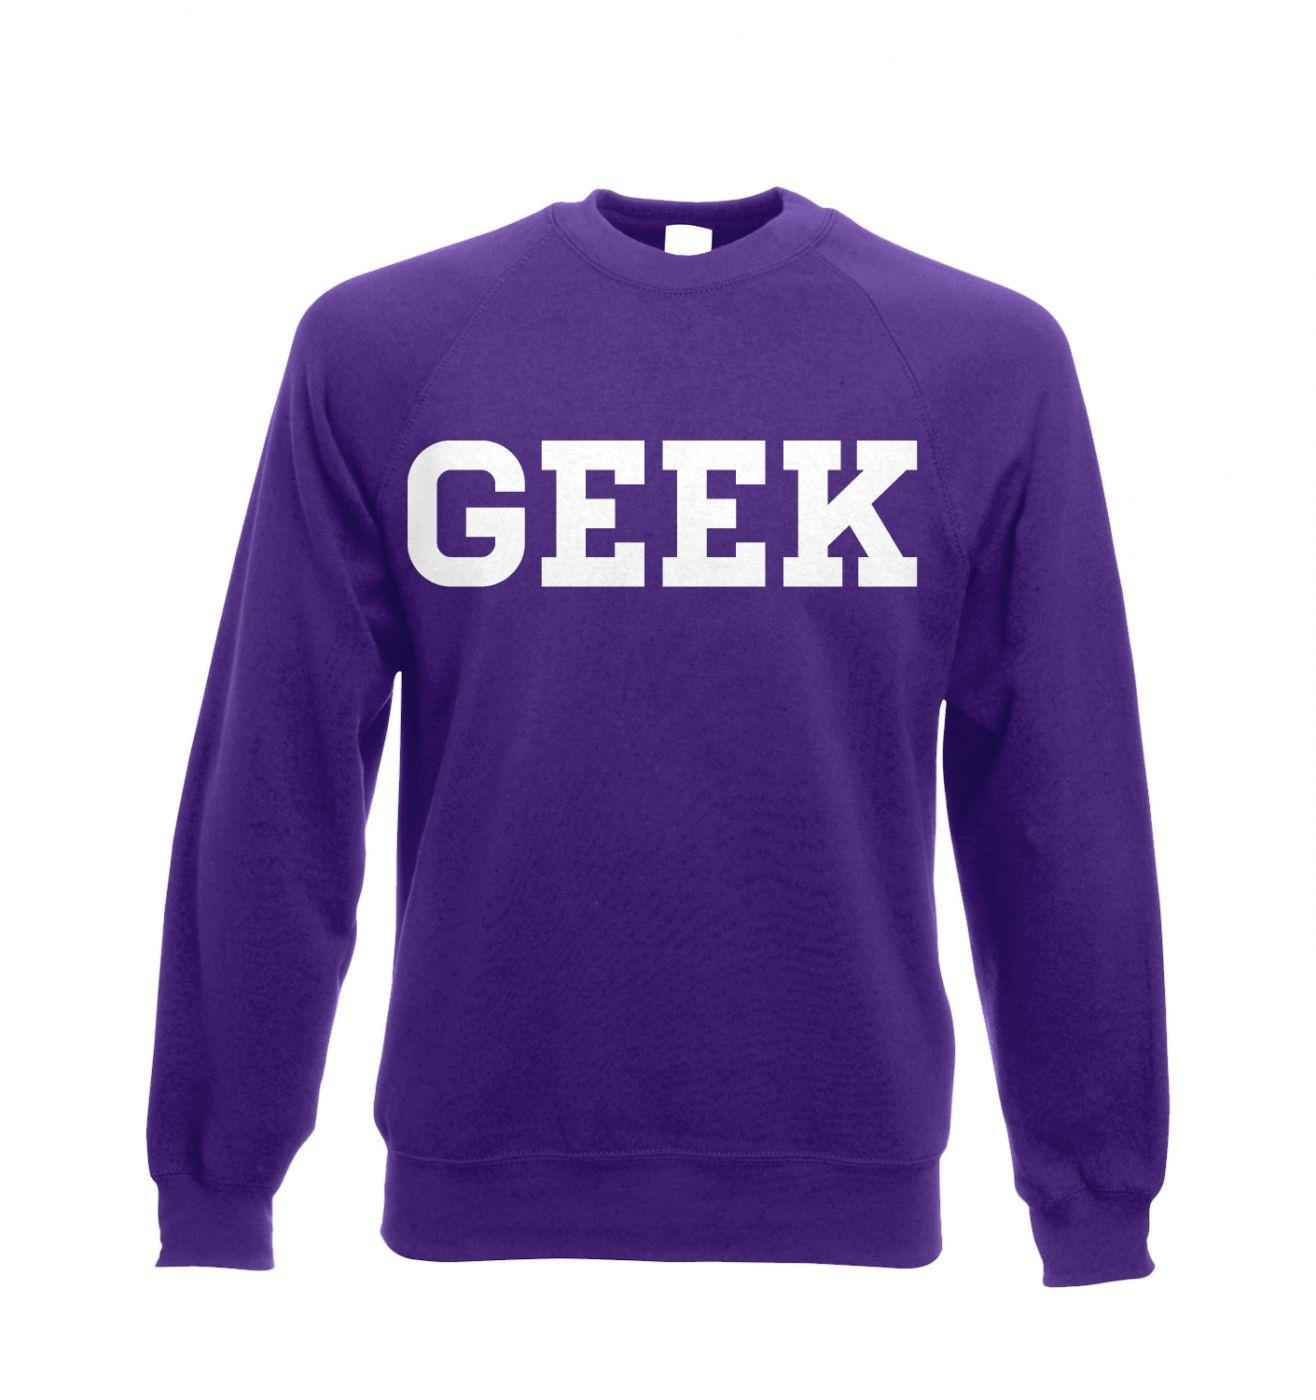 Geek adult's crewneck sweatshirt